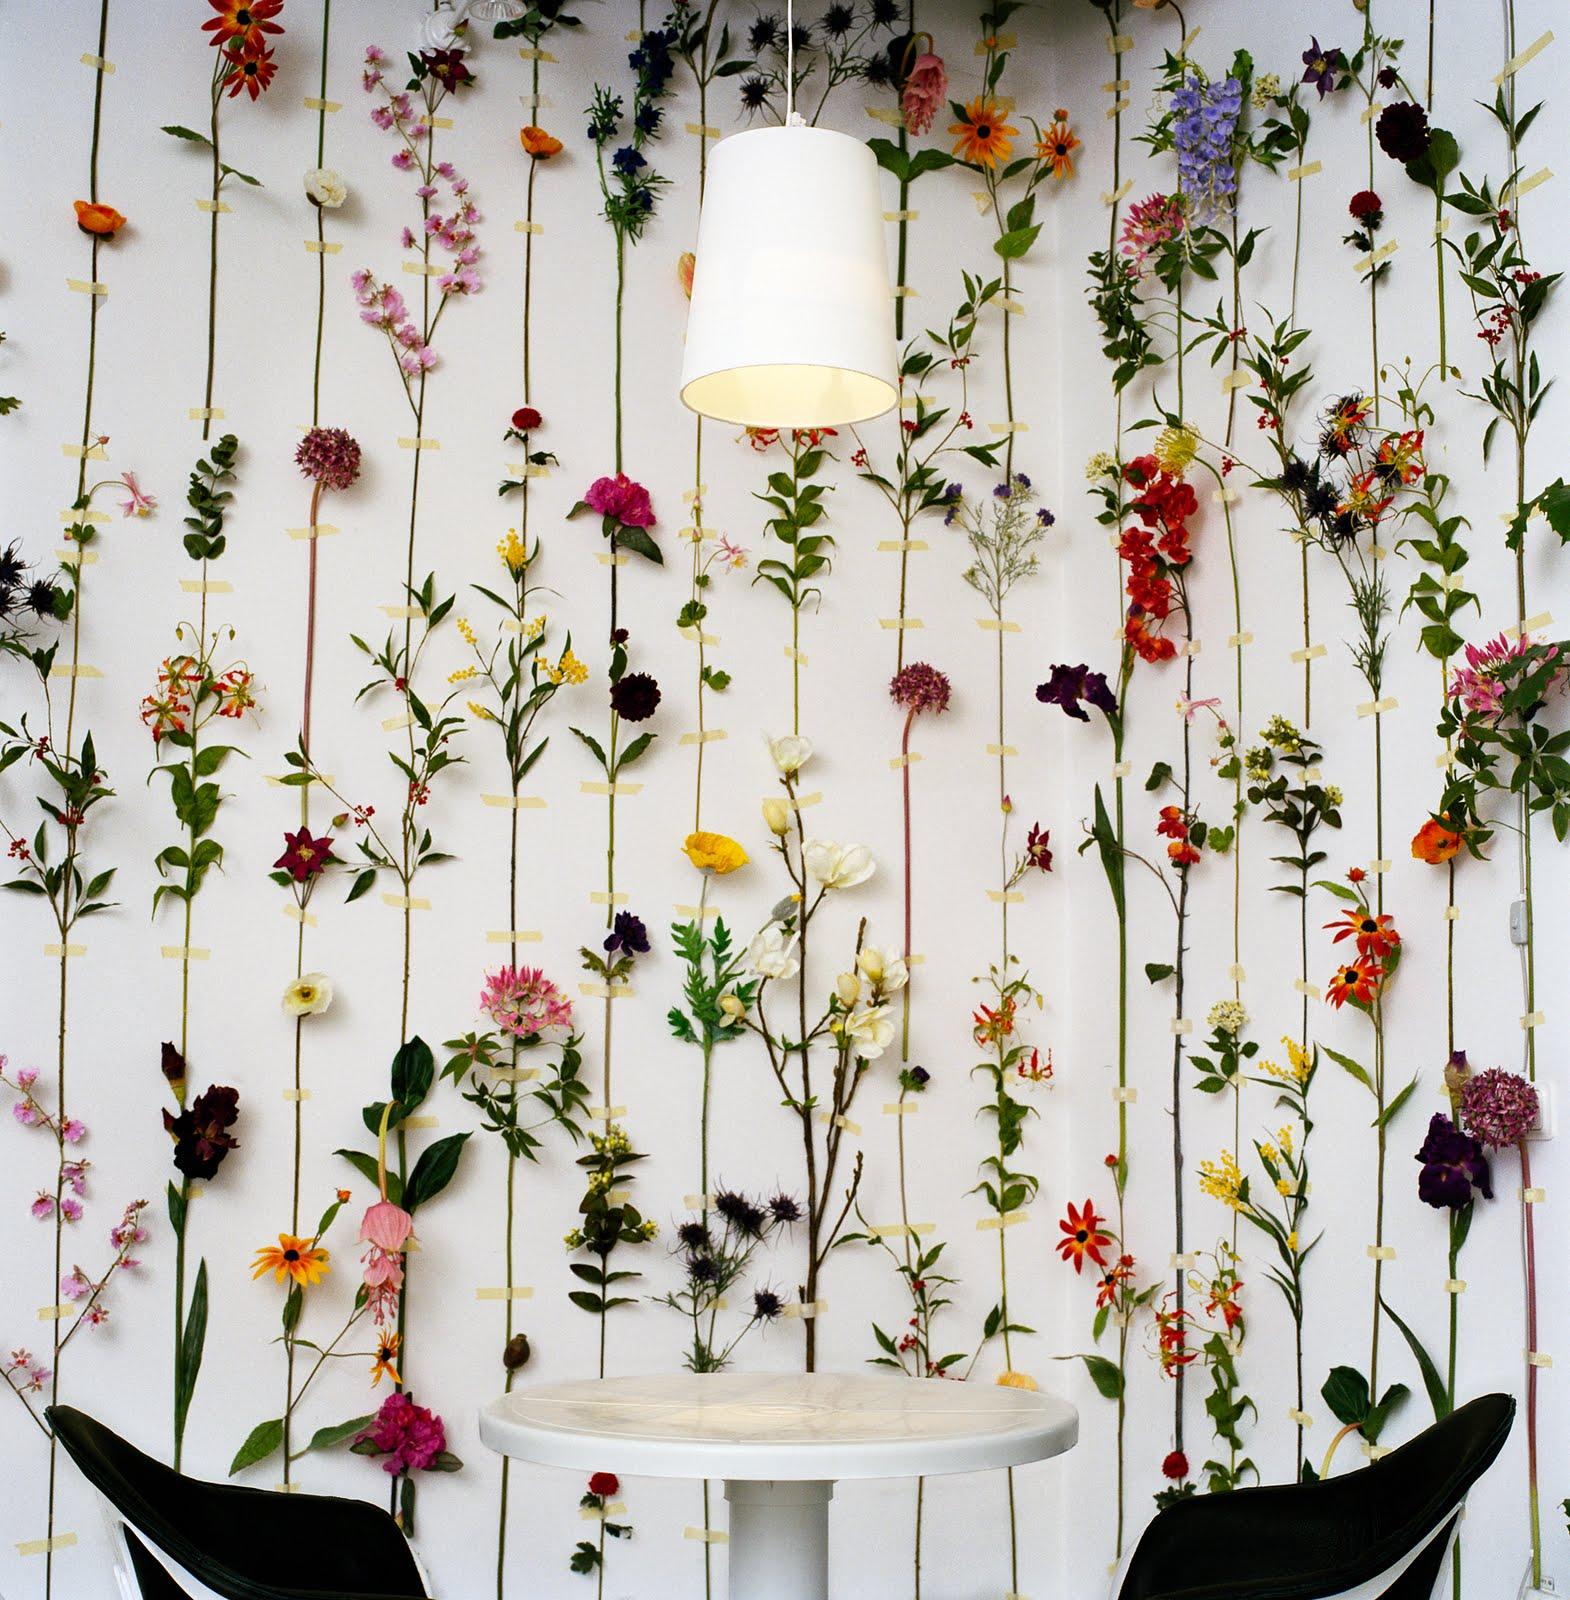 http://4.bp.blogspot.com/-ZMimFOGGkiE/TmSopsRH7vI/AAAAAAAADx0/tp0oJQfbFJM/s1600/Flower-wallpaper.jpg